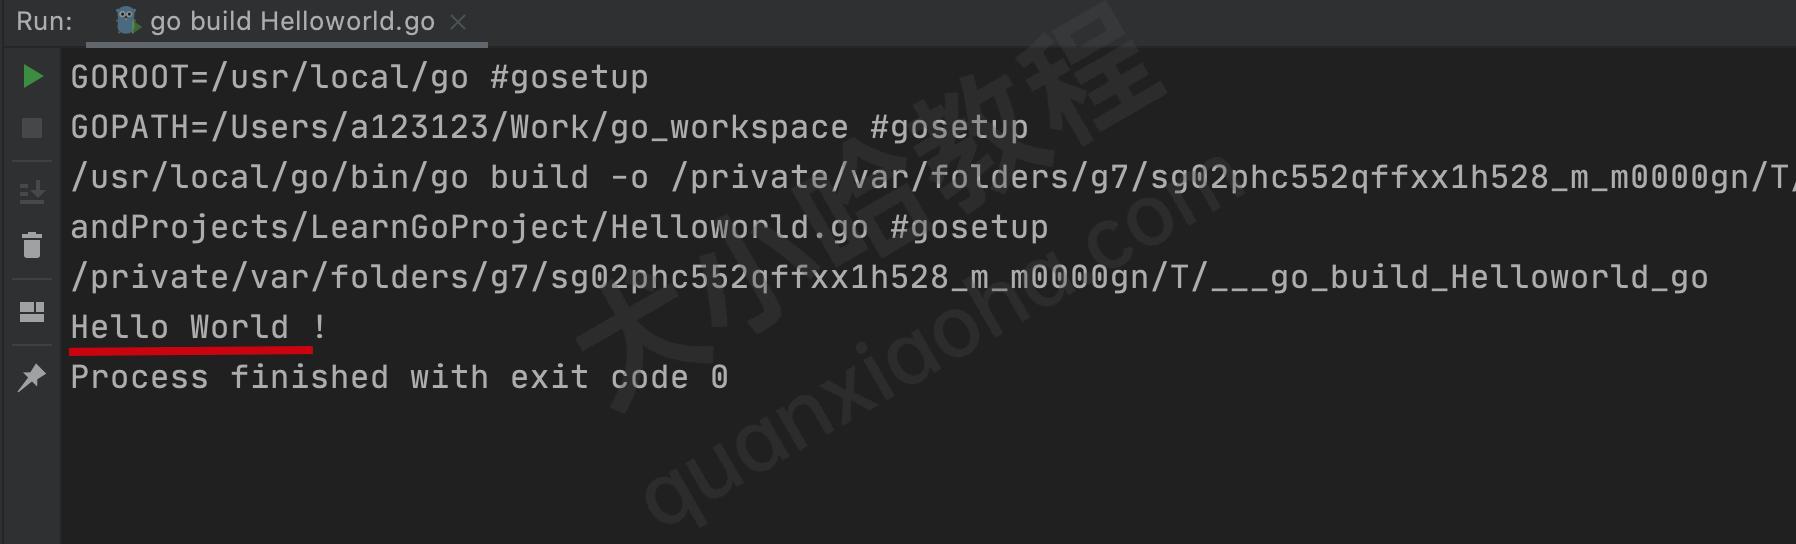 Jetbrains GoLang运行第一个Go程序